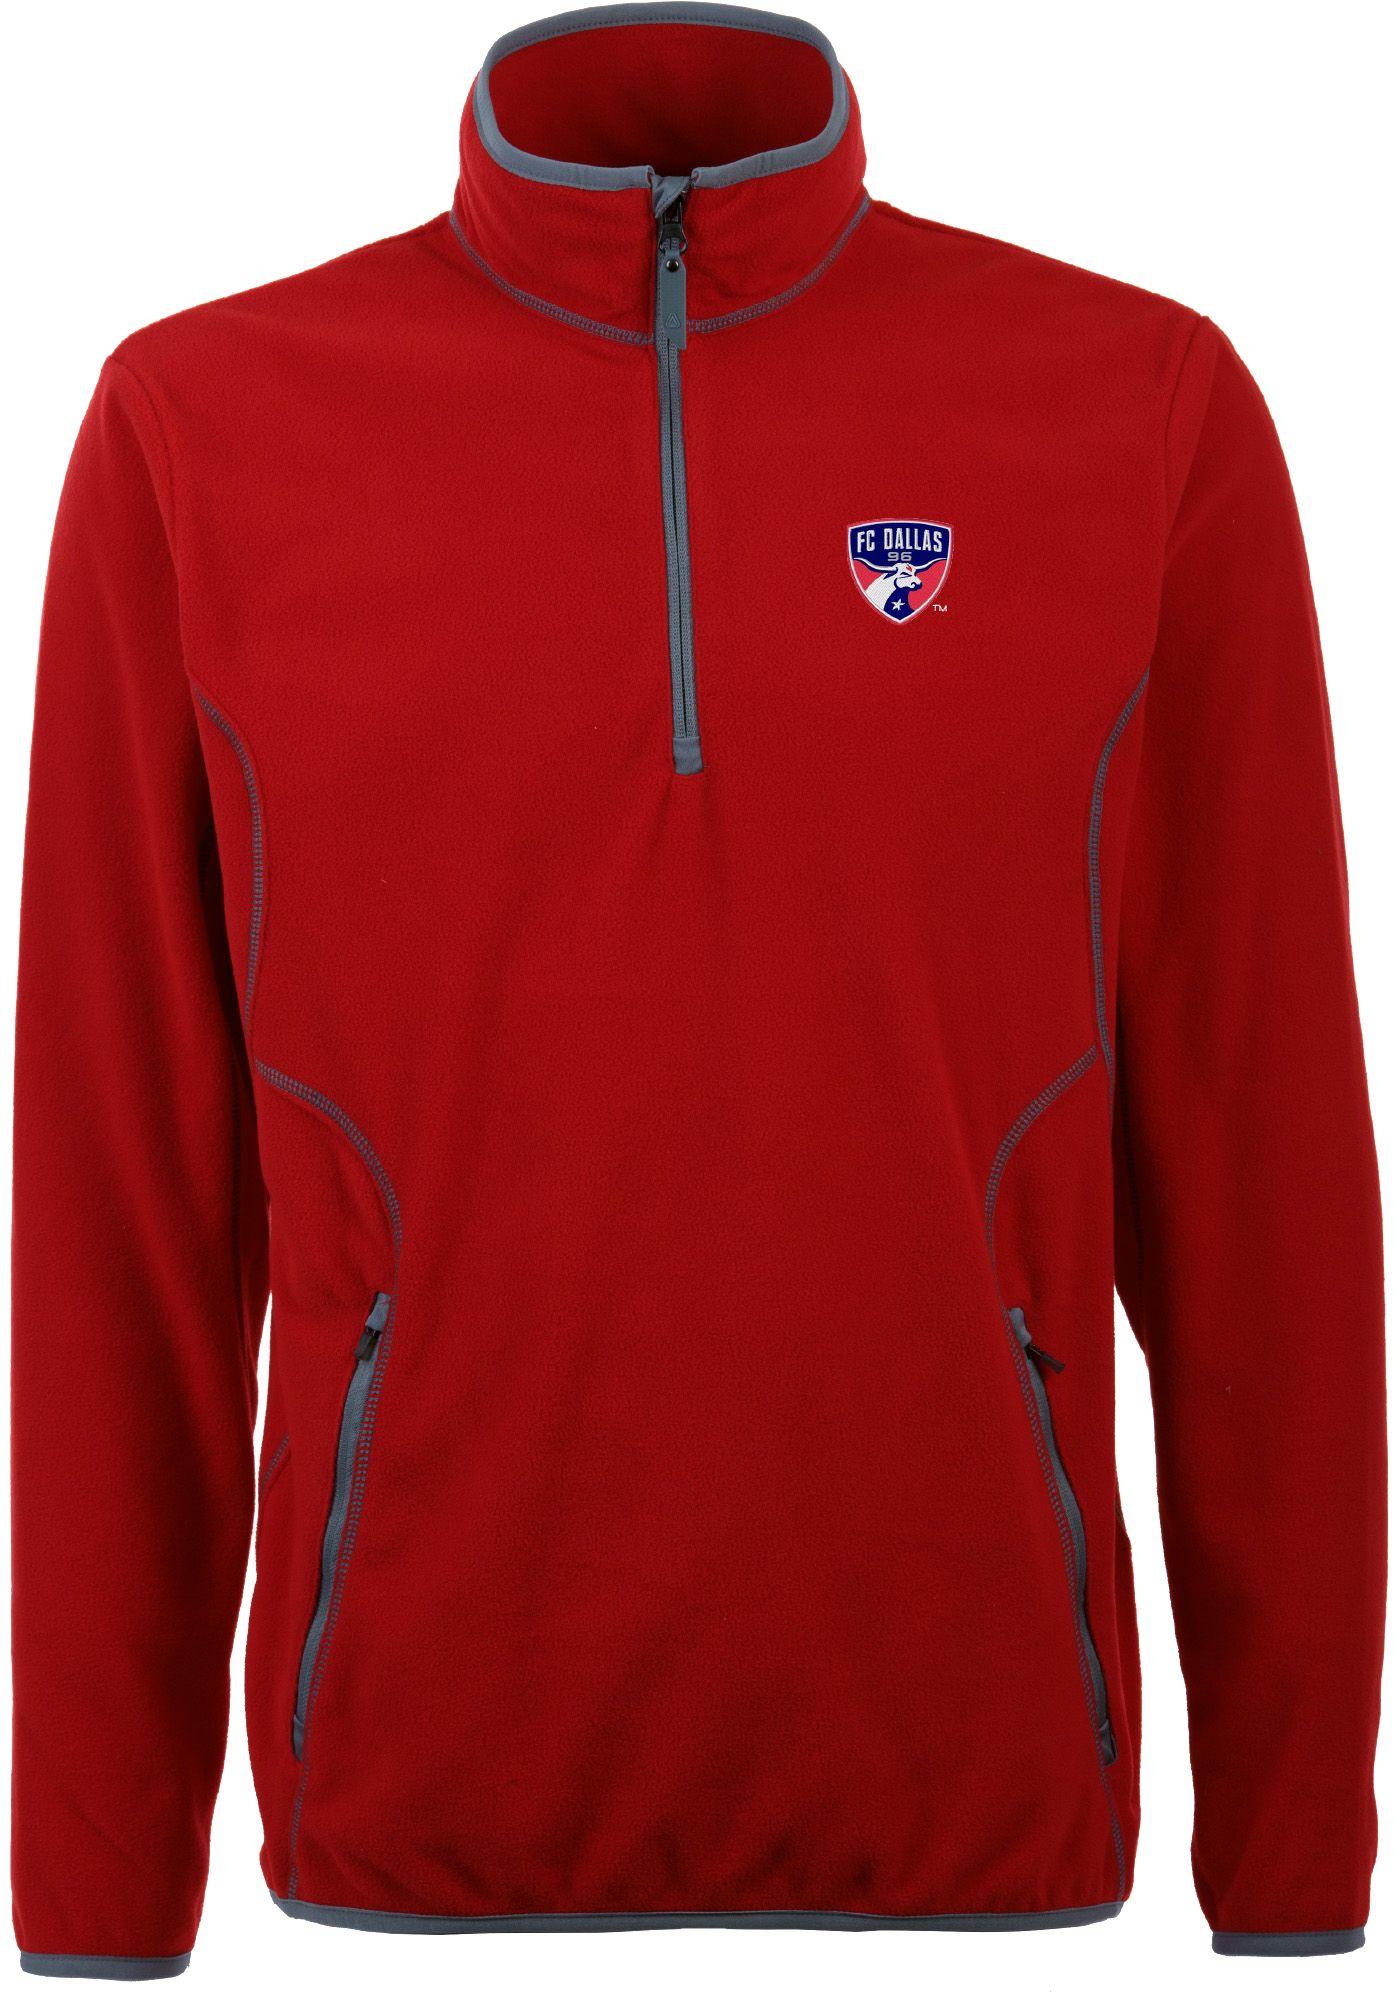 Antigua Men's FC Dallas Ice Red Quarter-Zip Fleece Jacket